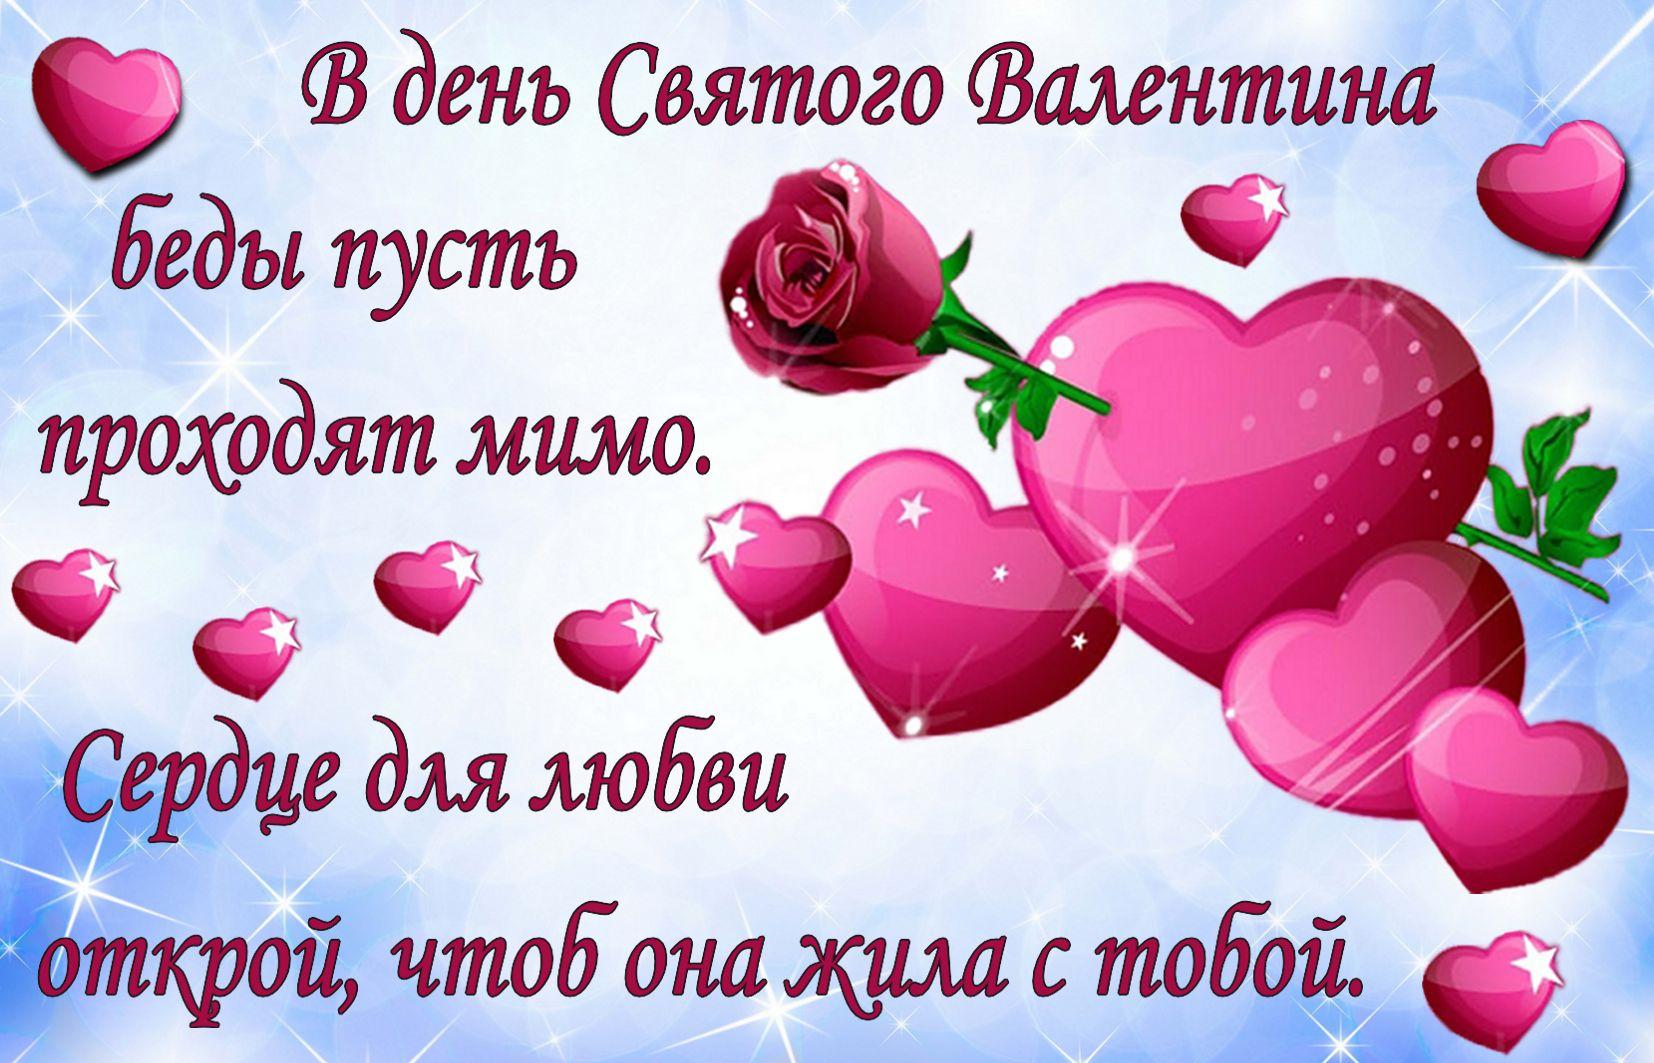 Текст открытки на день святого валентина, спасибо